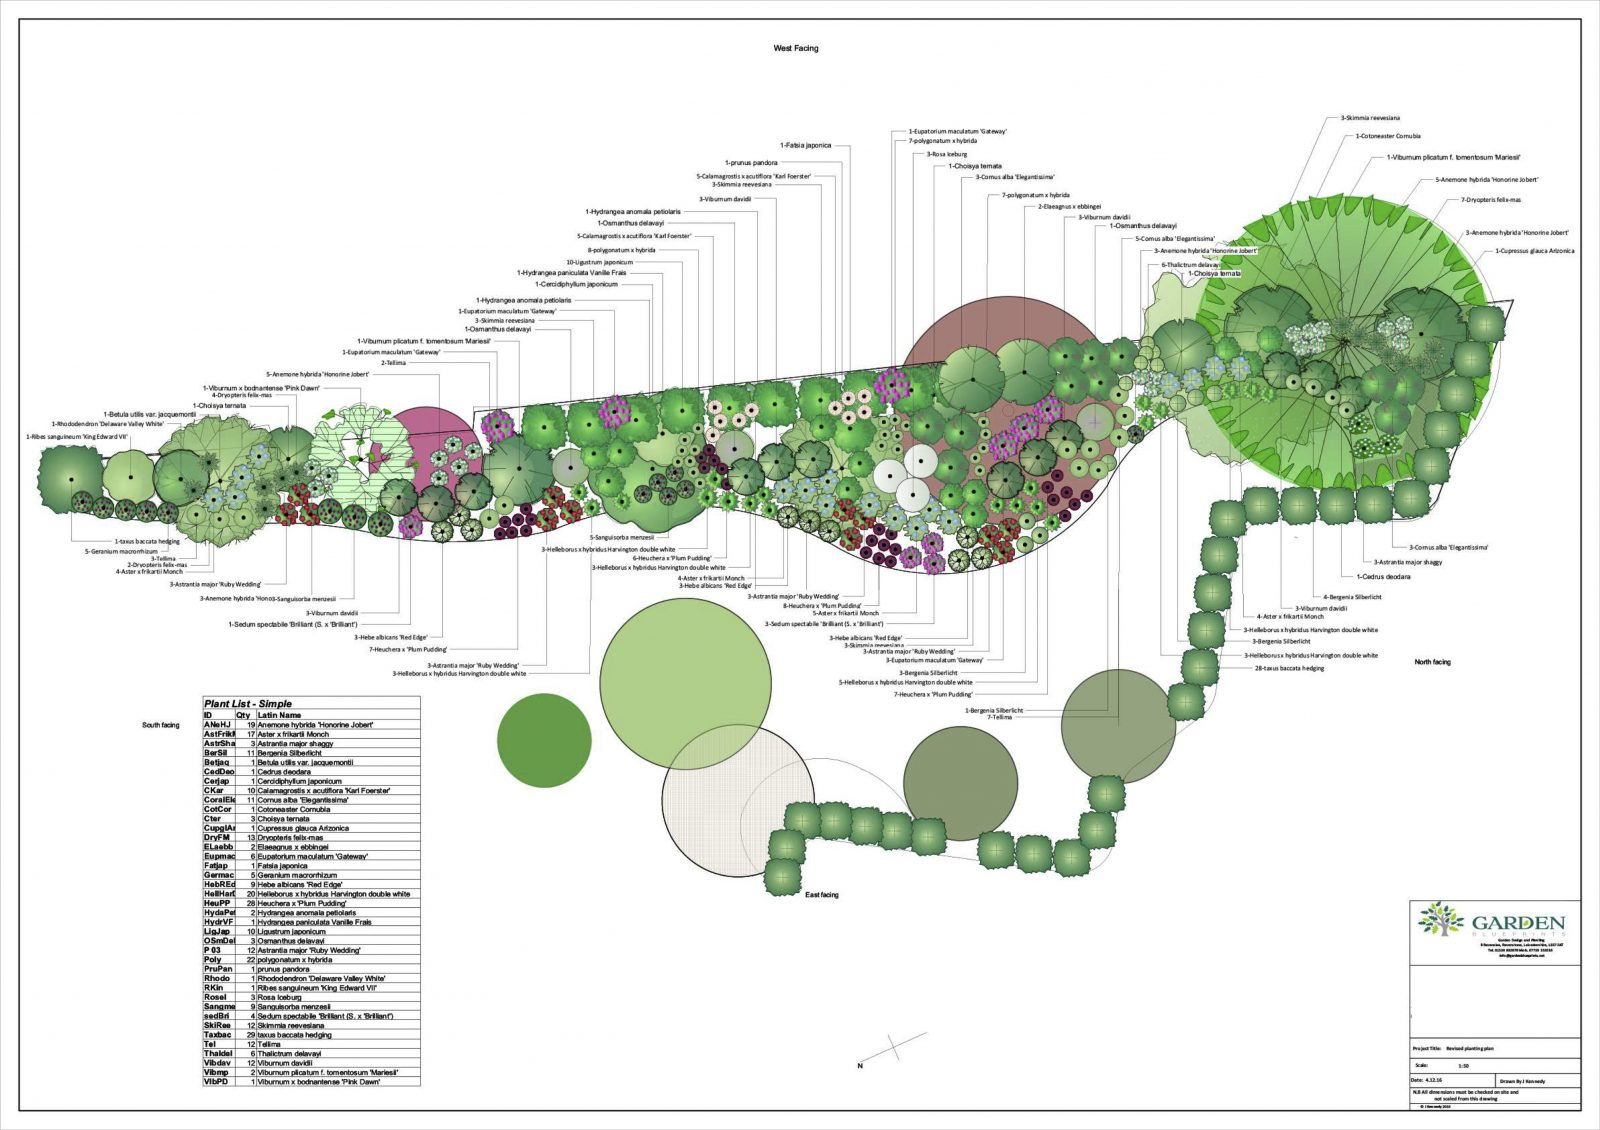 Higginson_planting_plan_rev1b | Garden Blueprints